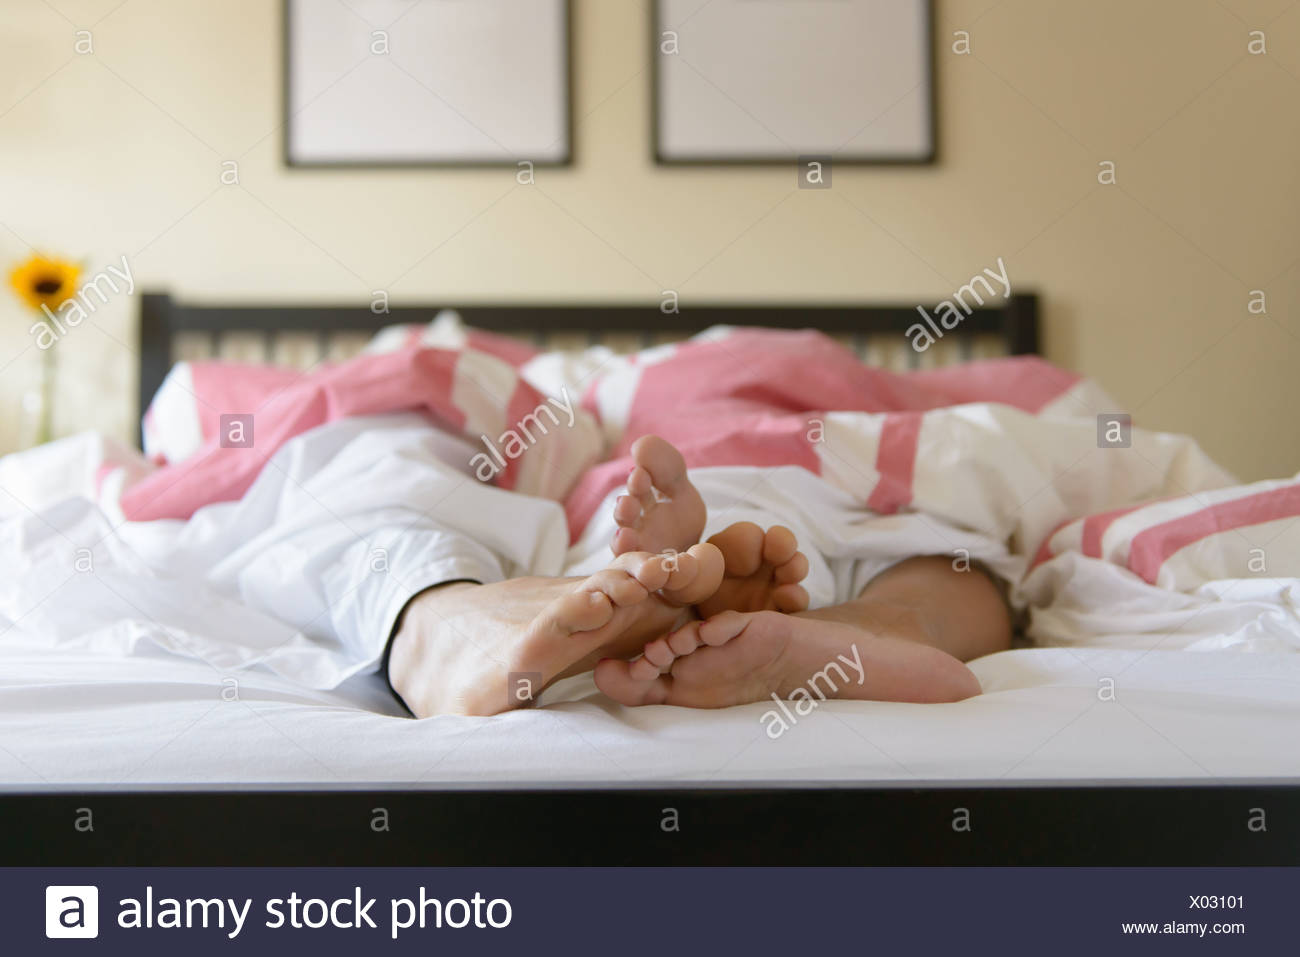 Oberfläche Ebene Bild des jungen Paares im Bett, Füße aus der Bettdecke Stockbild